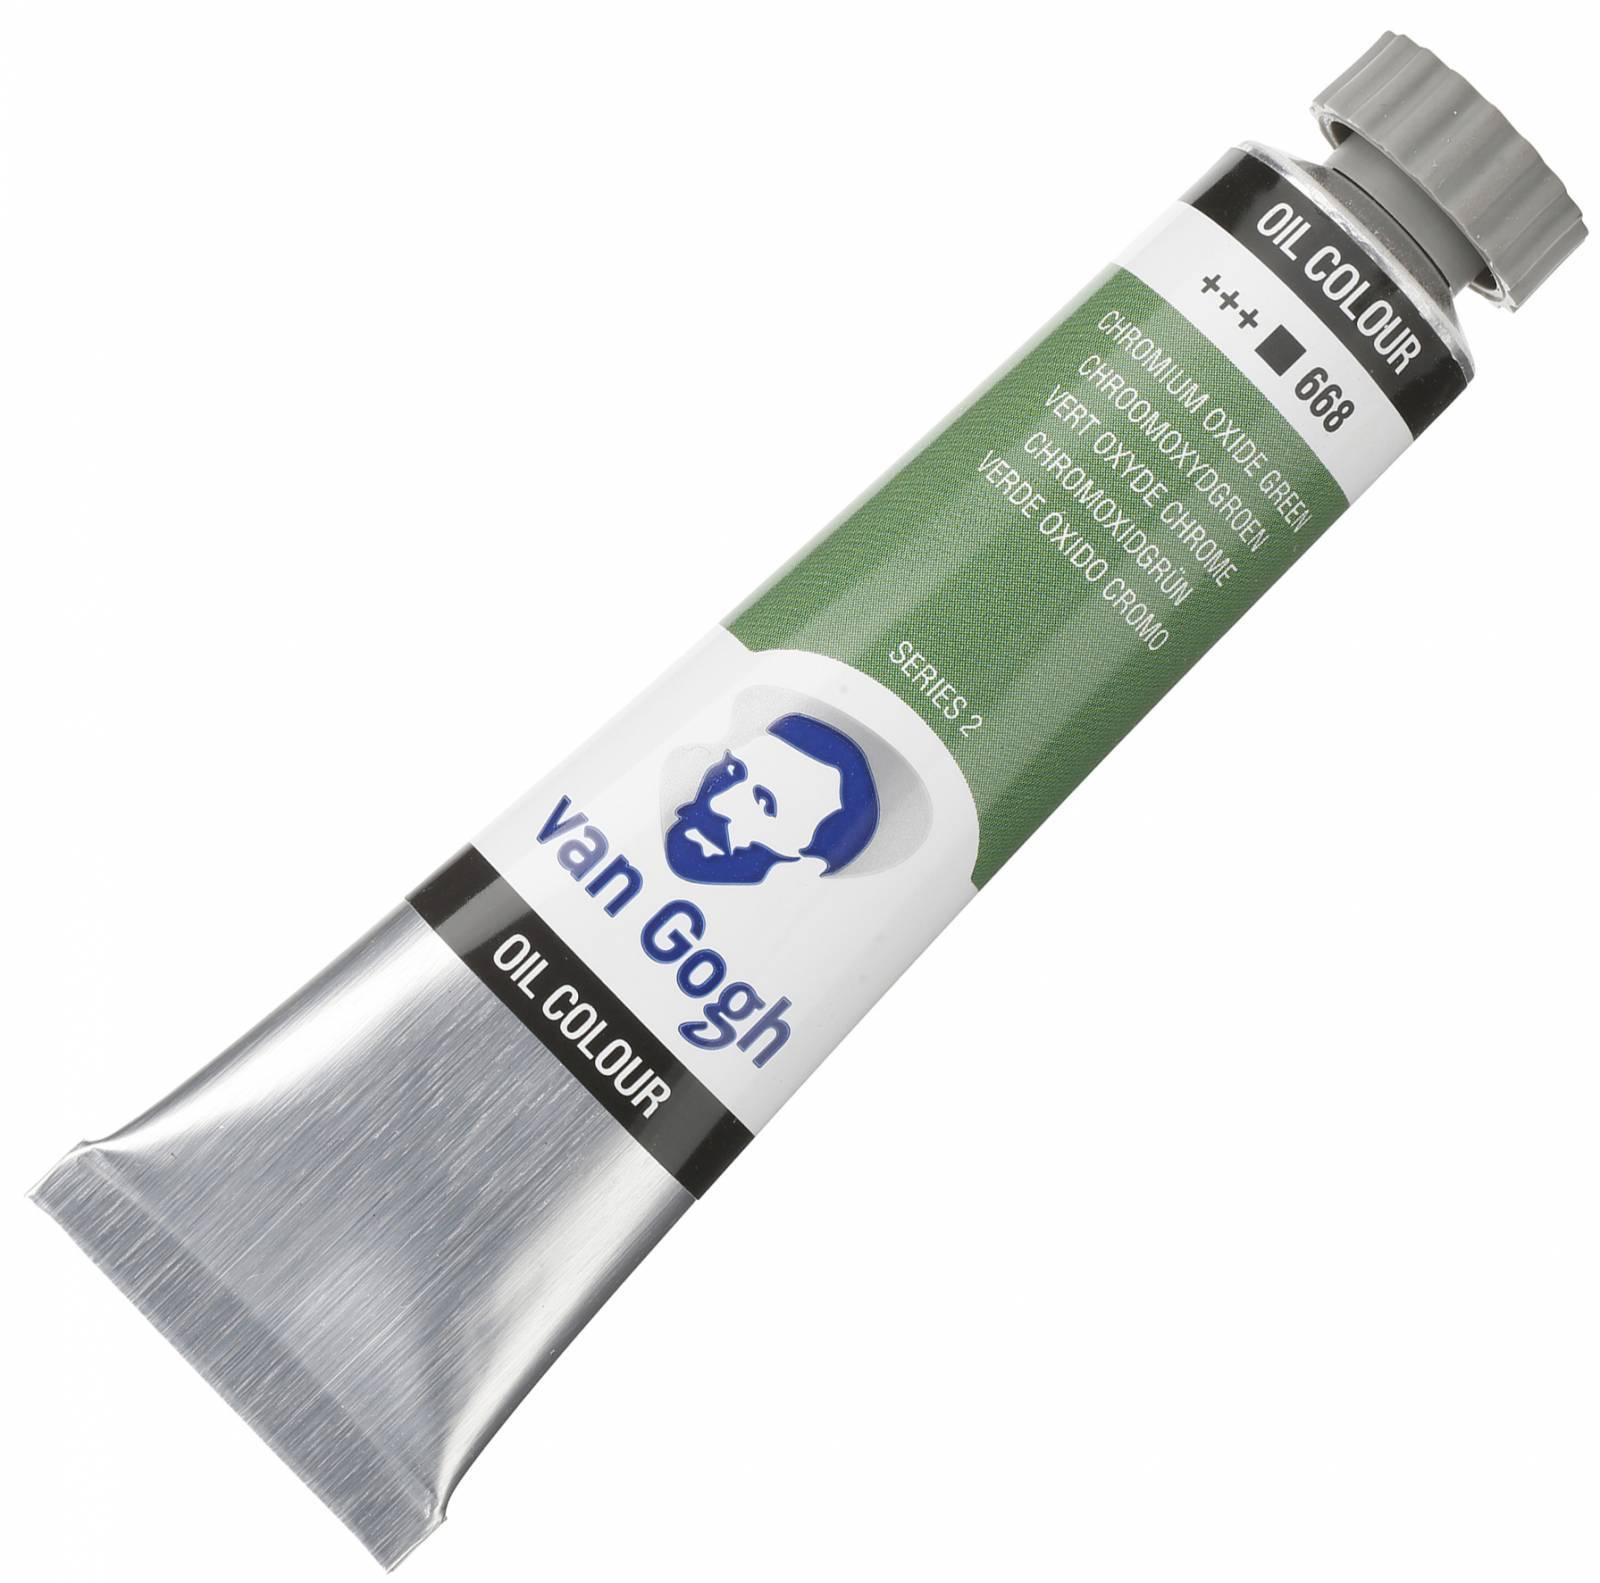 Oleo Van G. Chromium Ox.Green +++668 - s2 tb 20ml